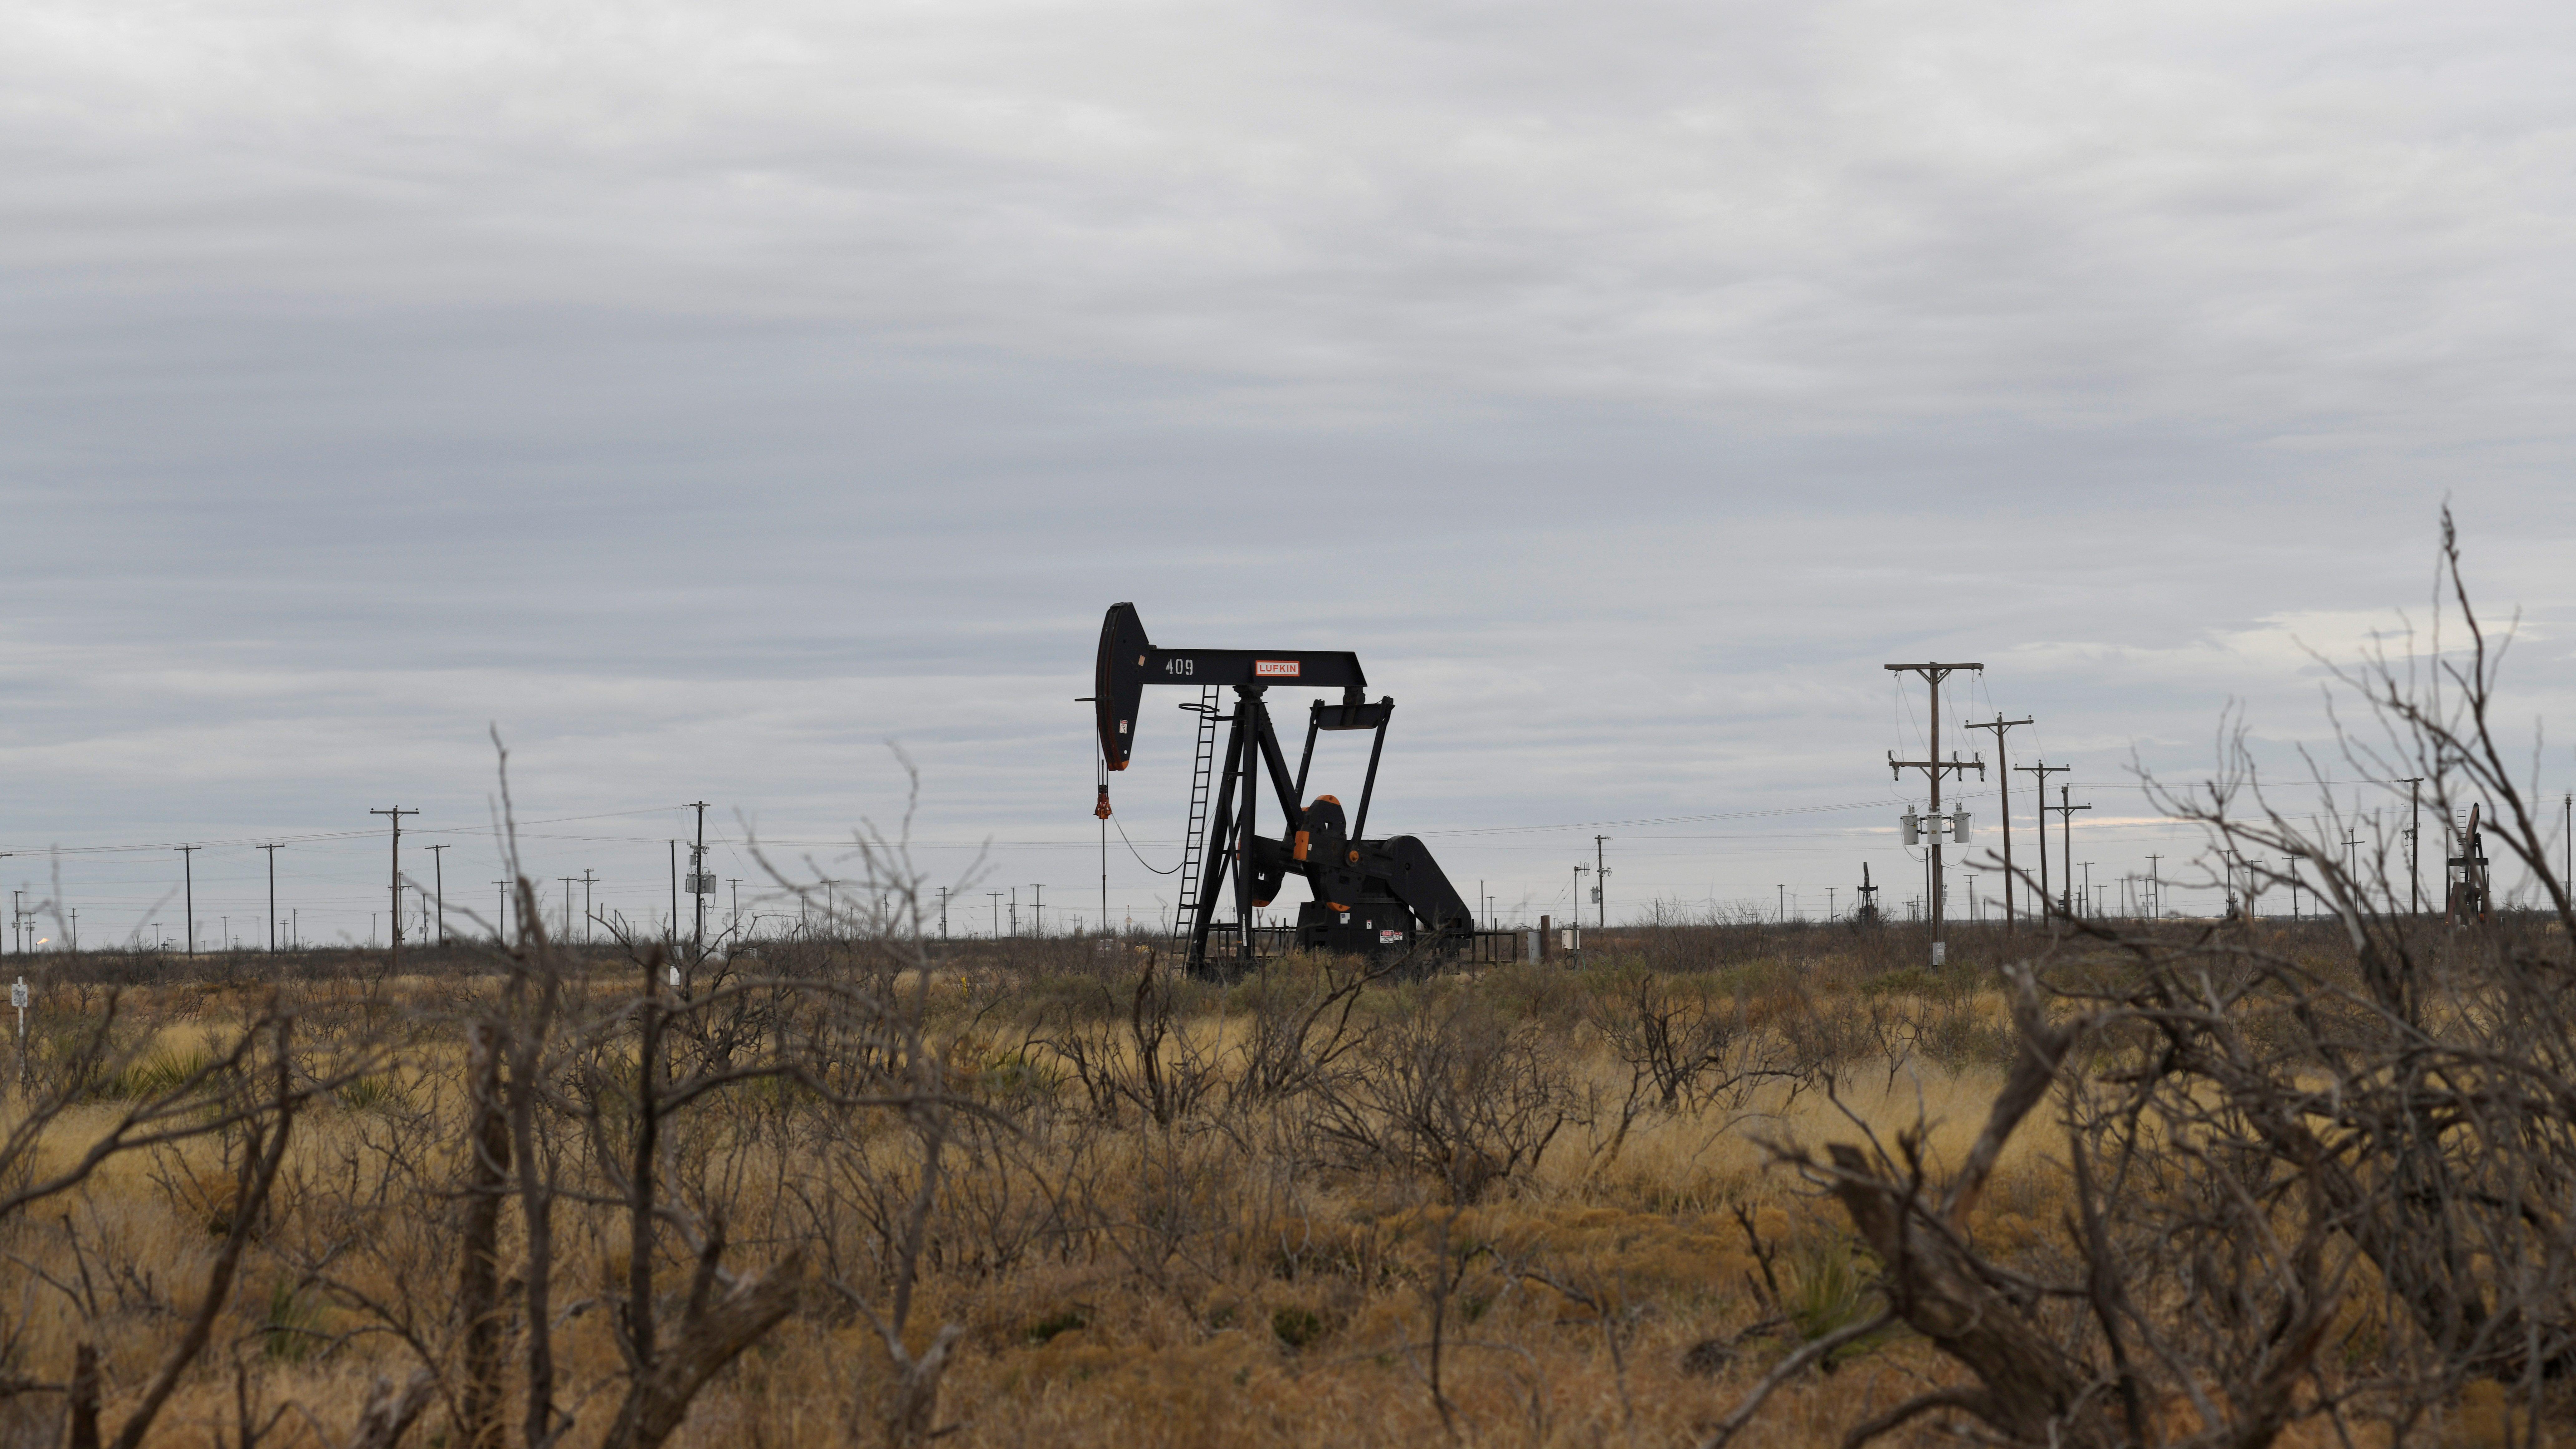 a pump jack in a Texas oil field